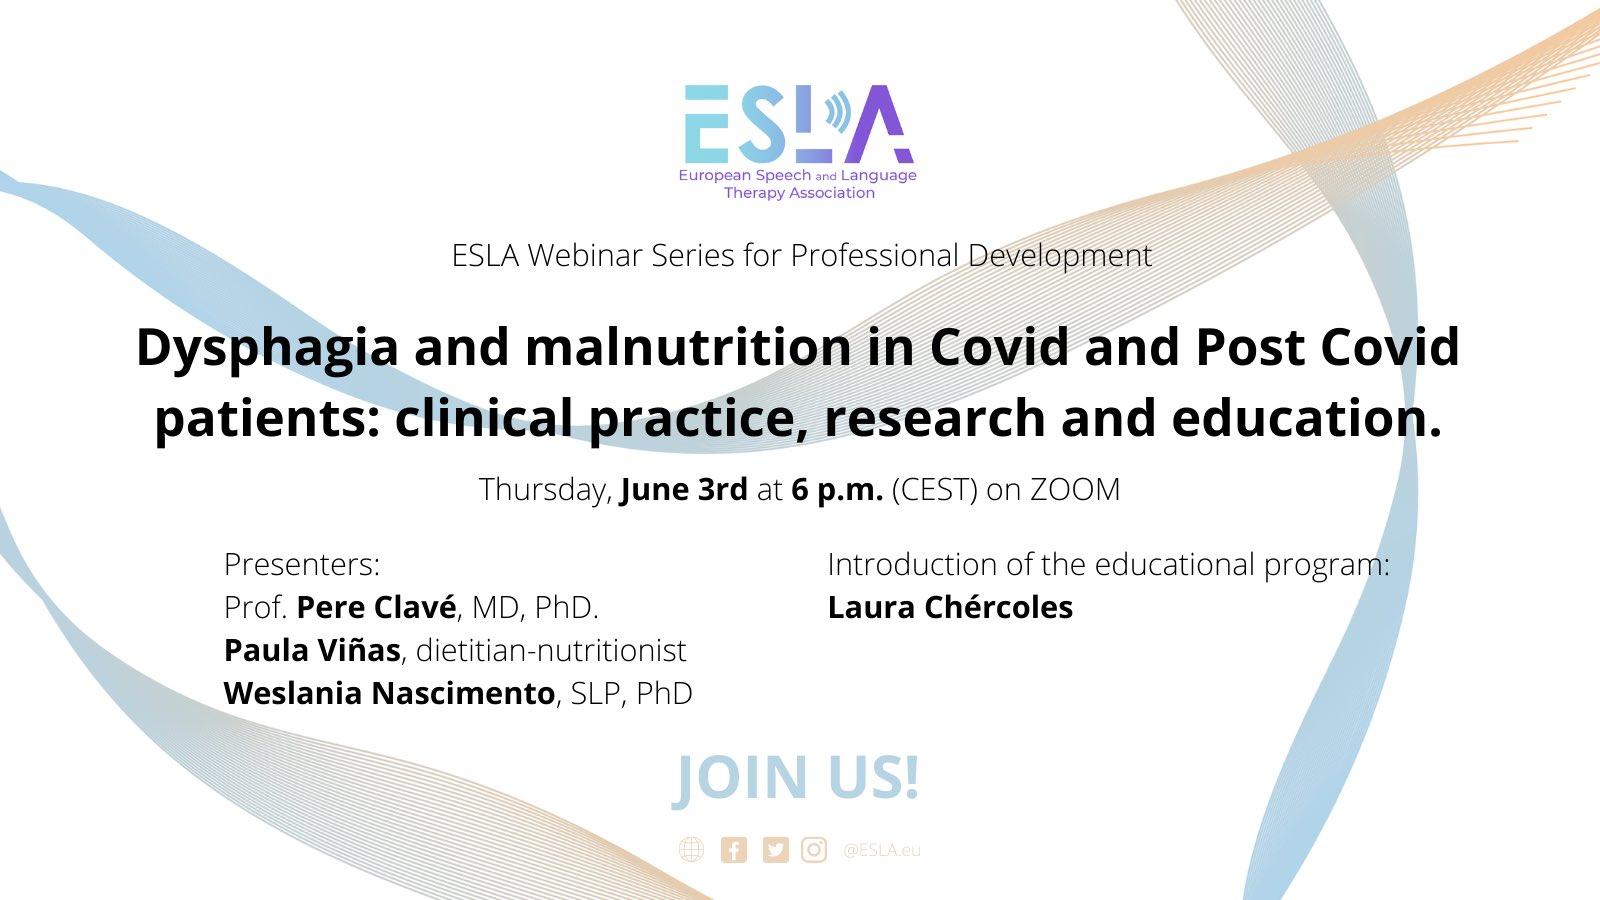 ESLA Professional Development webinar series